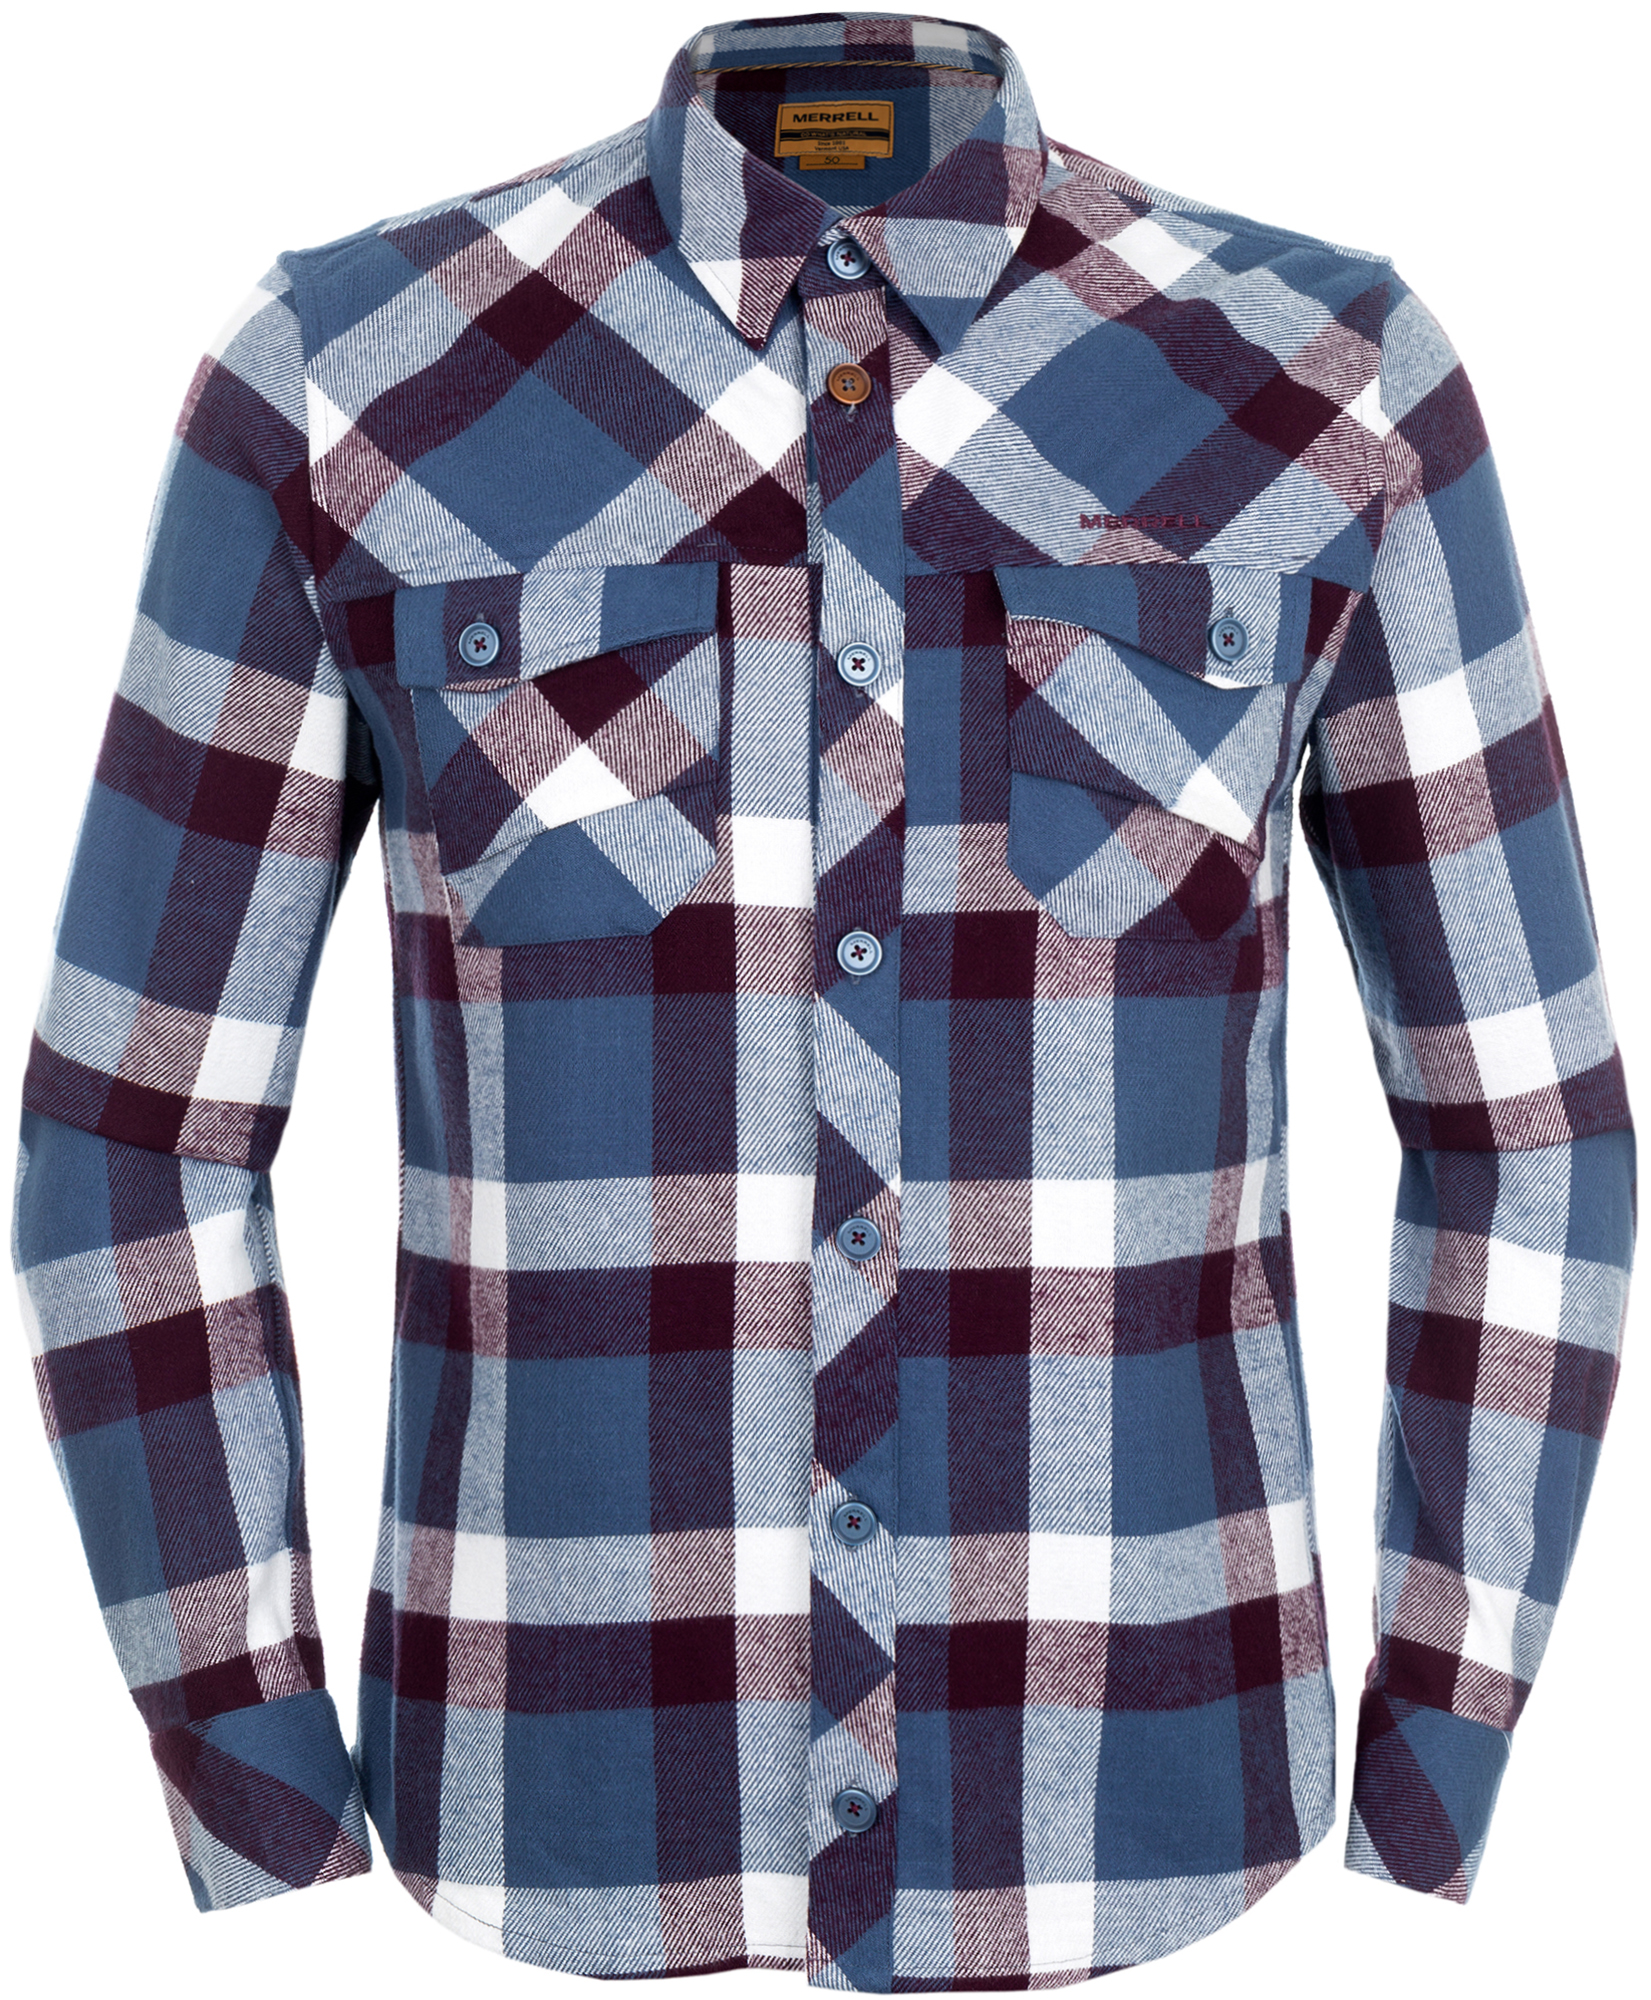 Merrell Рубашка с длинным рукавом мужская Merrell Germania рубашка мужская muszoom ms14c074c